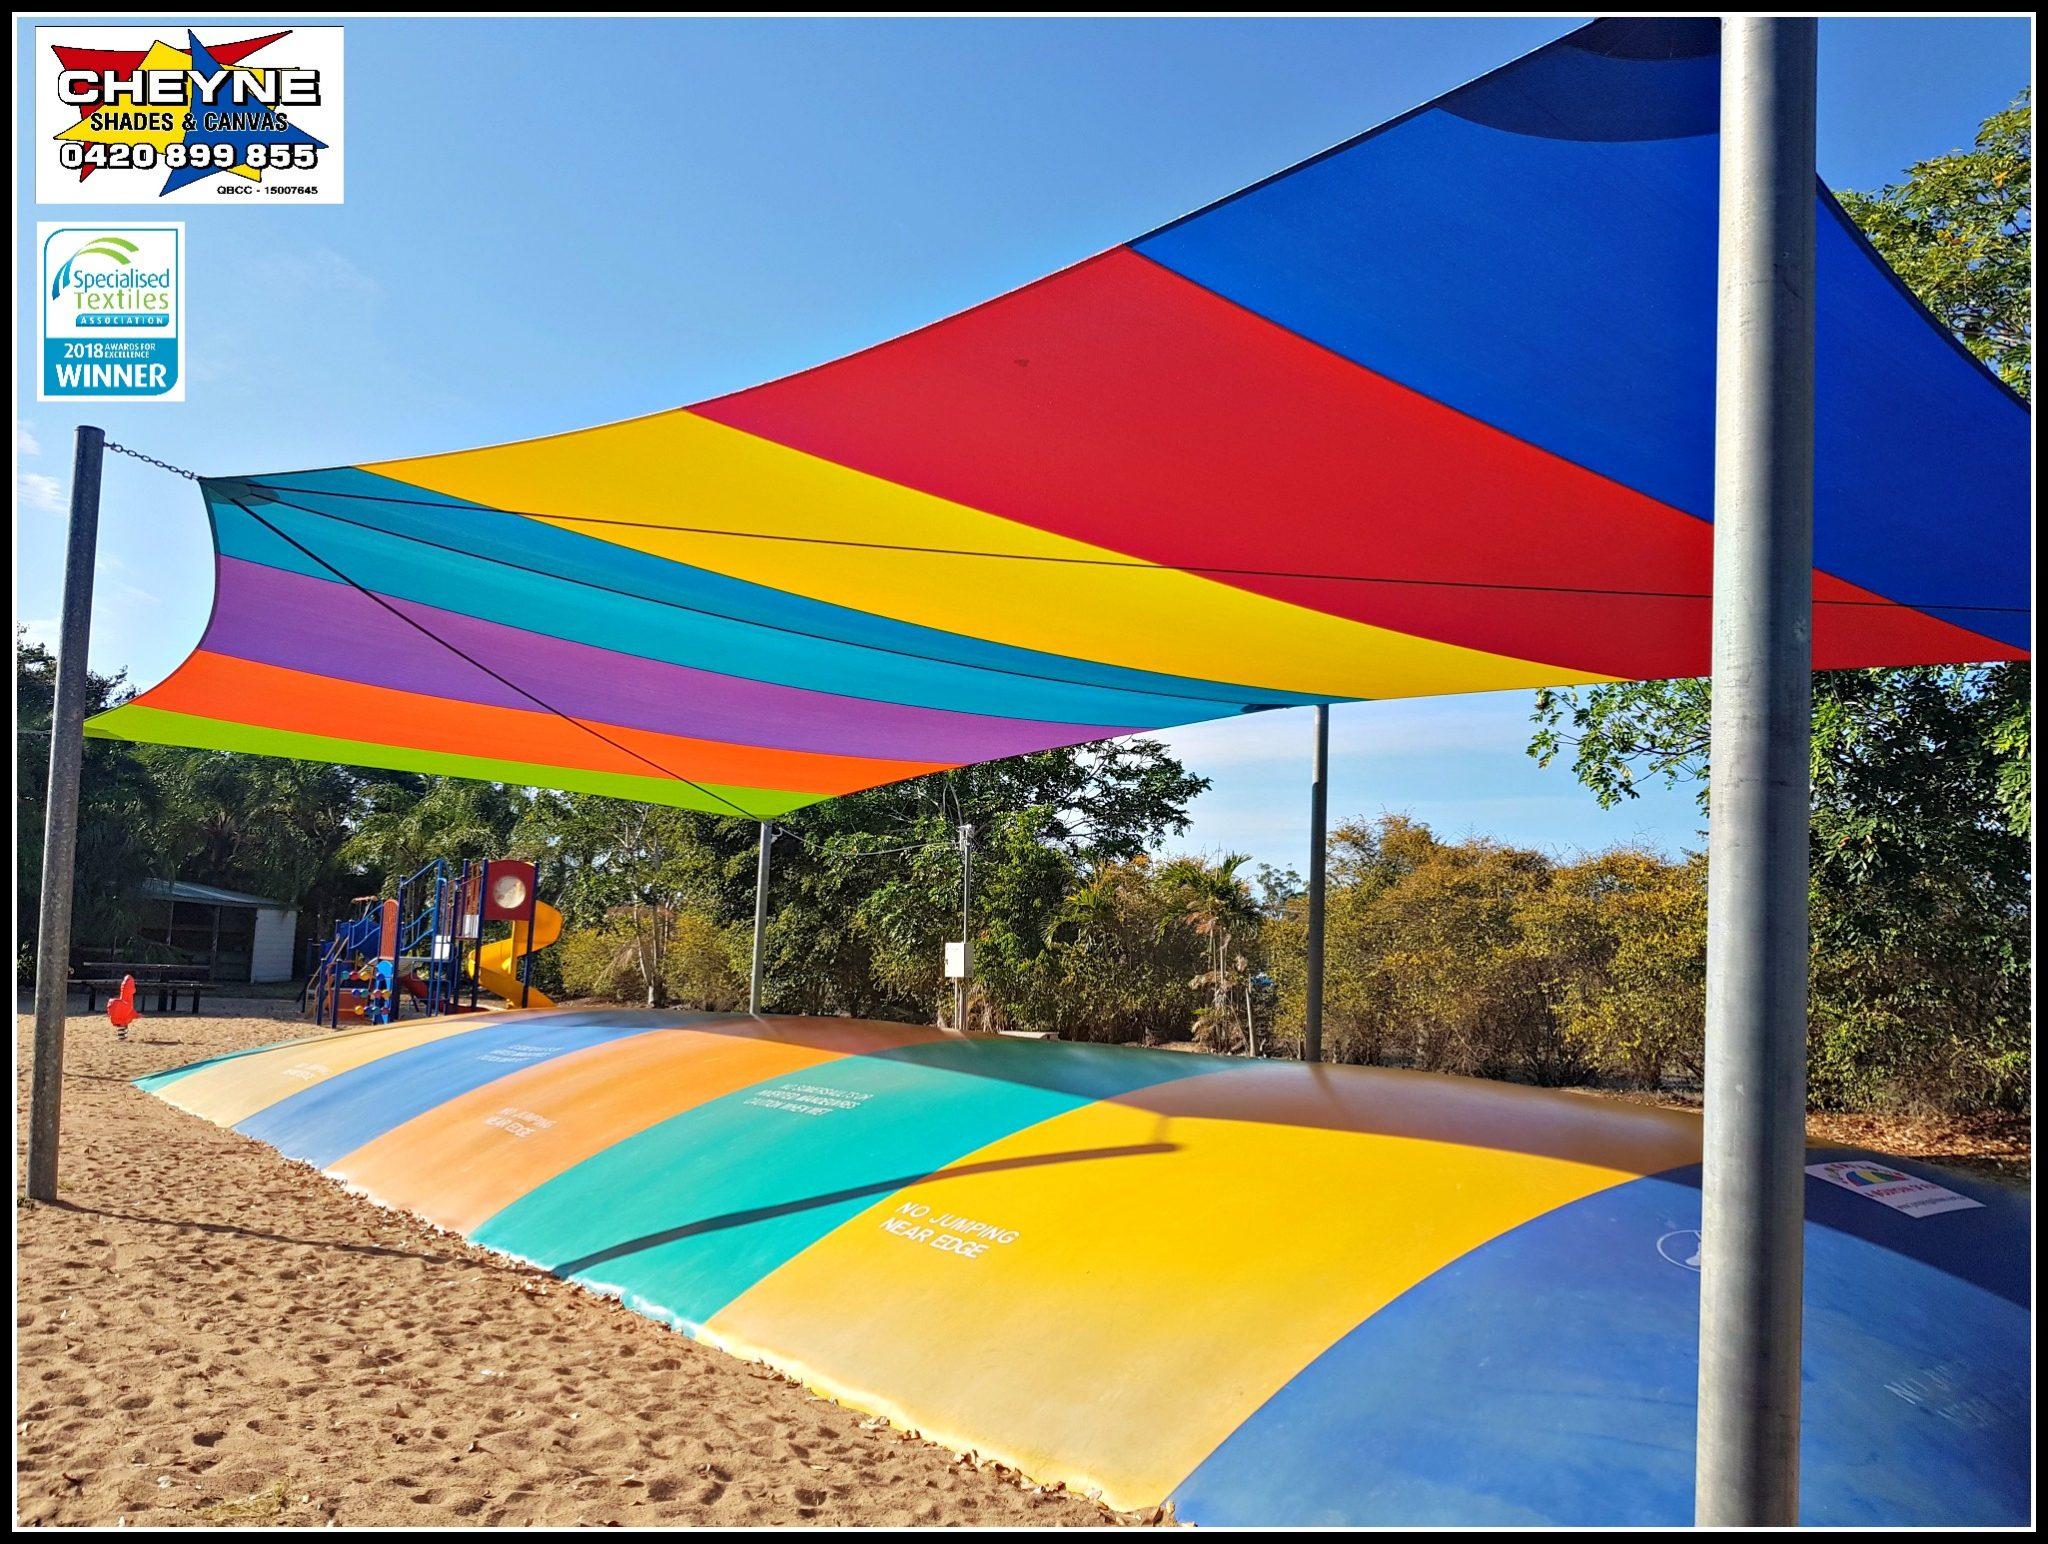 Shade Sails Residential Cheyne Shades Amp Canvas